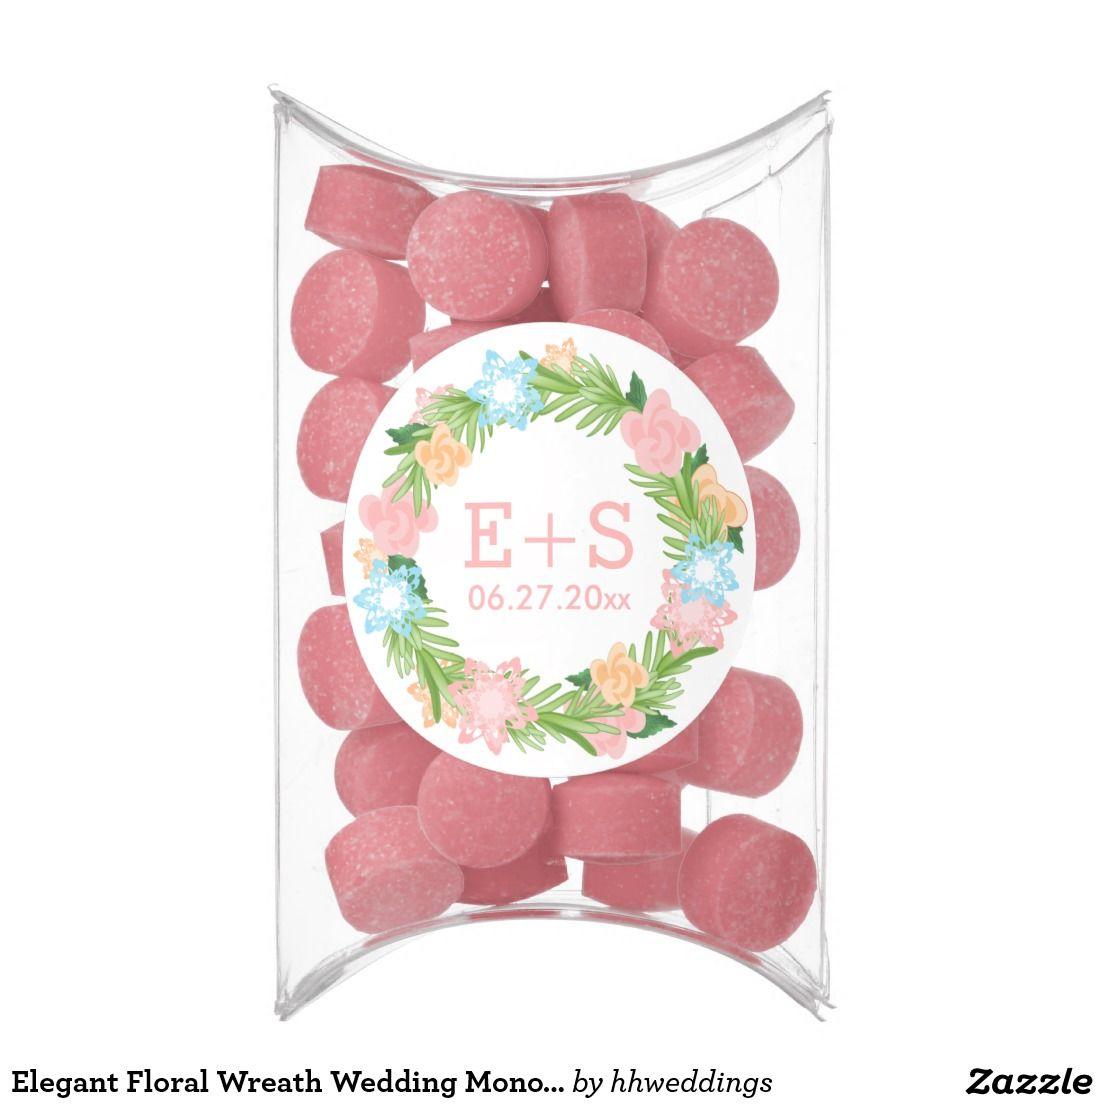 Elegant Floral Wreath Wedding Monogram Chewing Gum Favors | Wedding ...